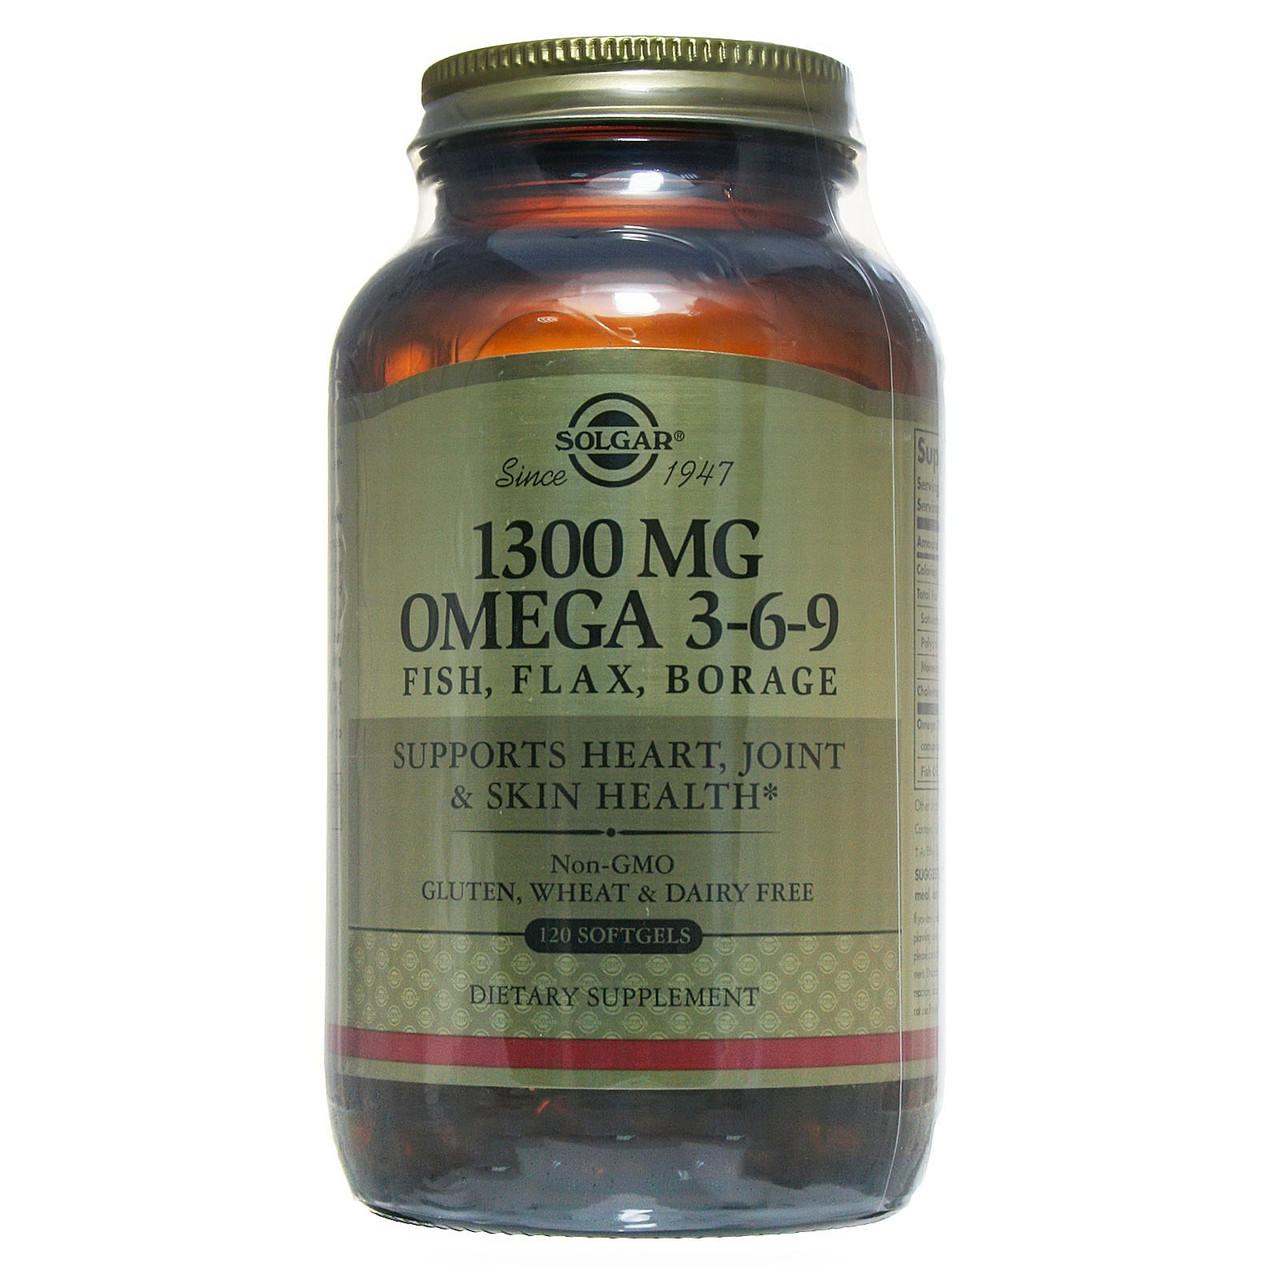 Рыбий жир, Омега 3 6 9 (EFA, Omega 3-6-9), Solgar, 1300 мг, 120 капсул